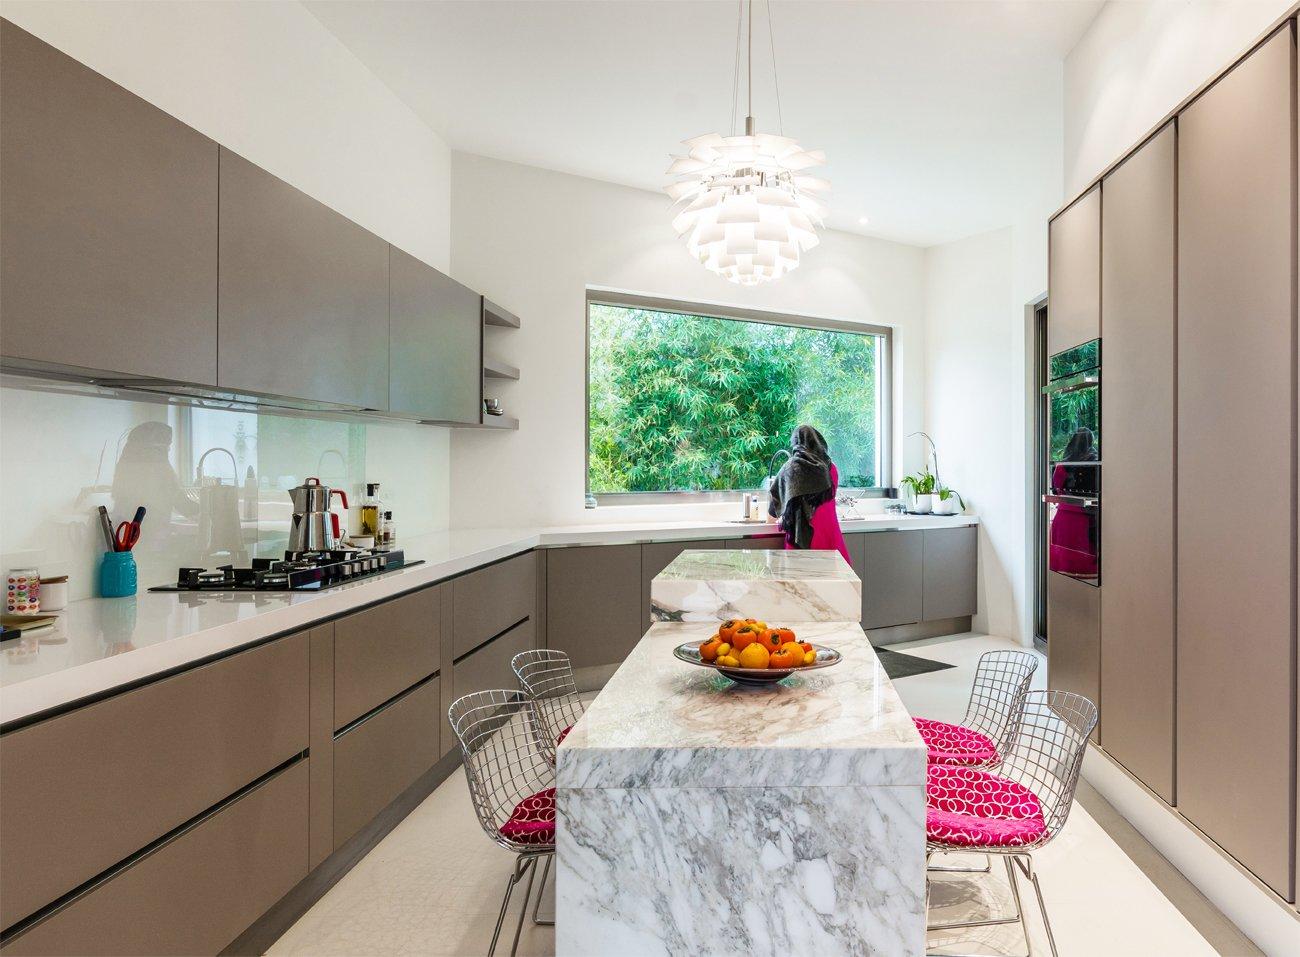 Tagged: Kitchen, Wall Oven, and Refrigerator.  Lavasan Villa by Hariri & Hariri Architecture